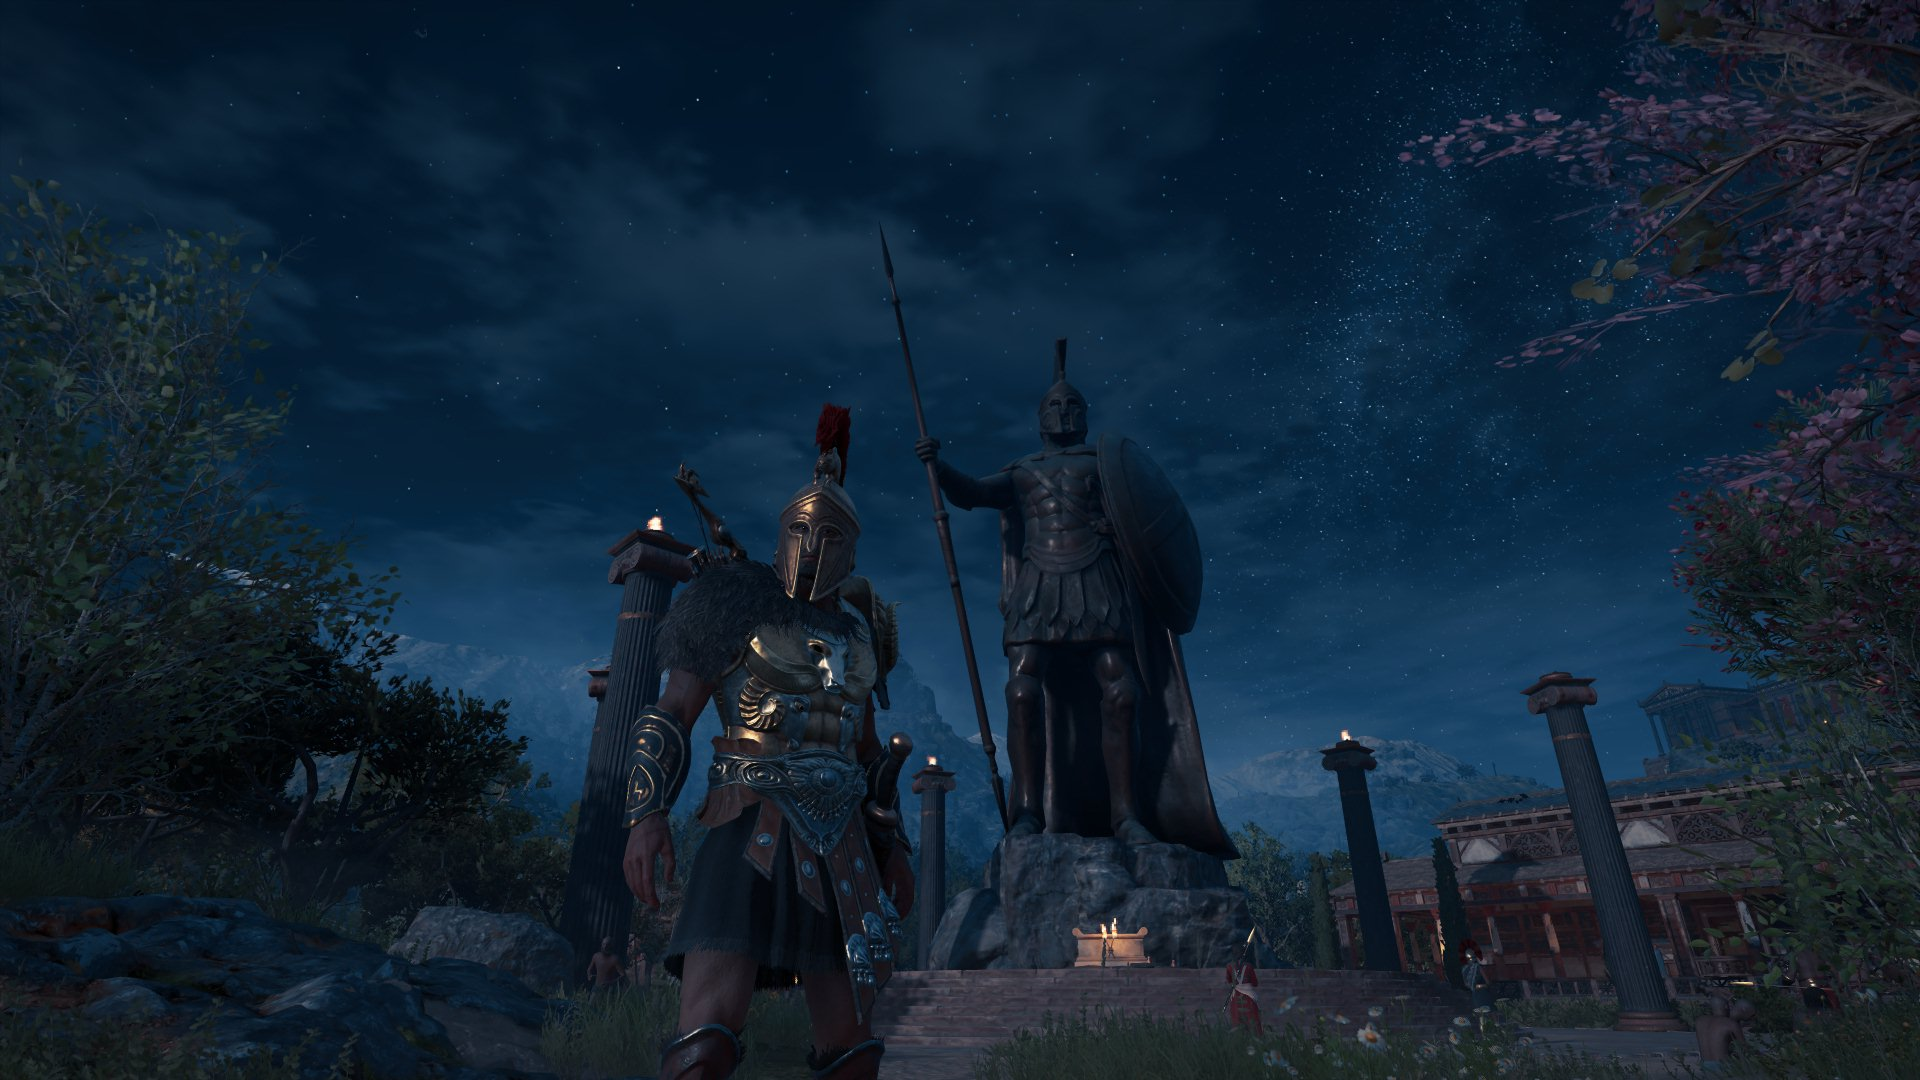 Assassin's Creed® Одиссея__63.jpeg - Assassin's Creed: Odyssey